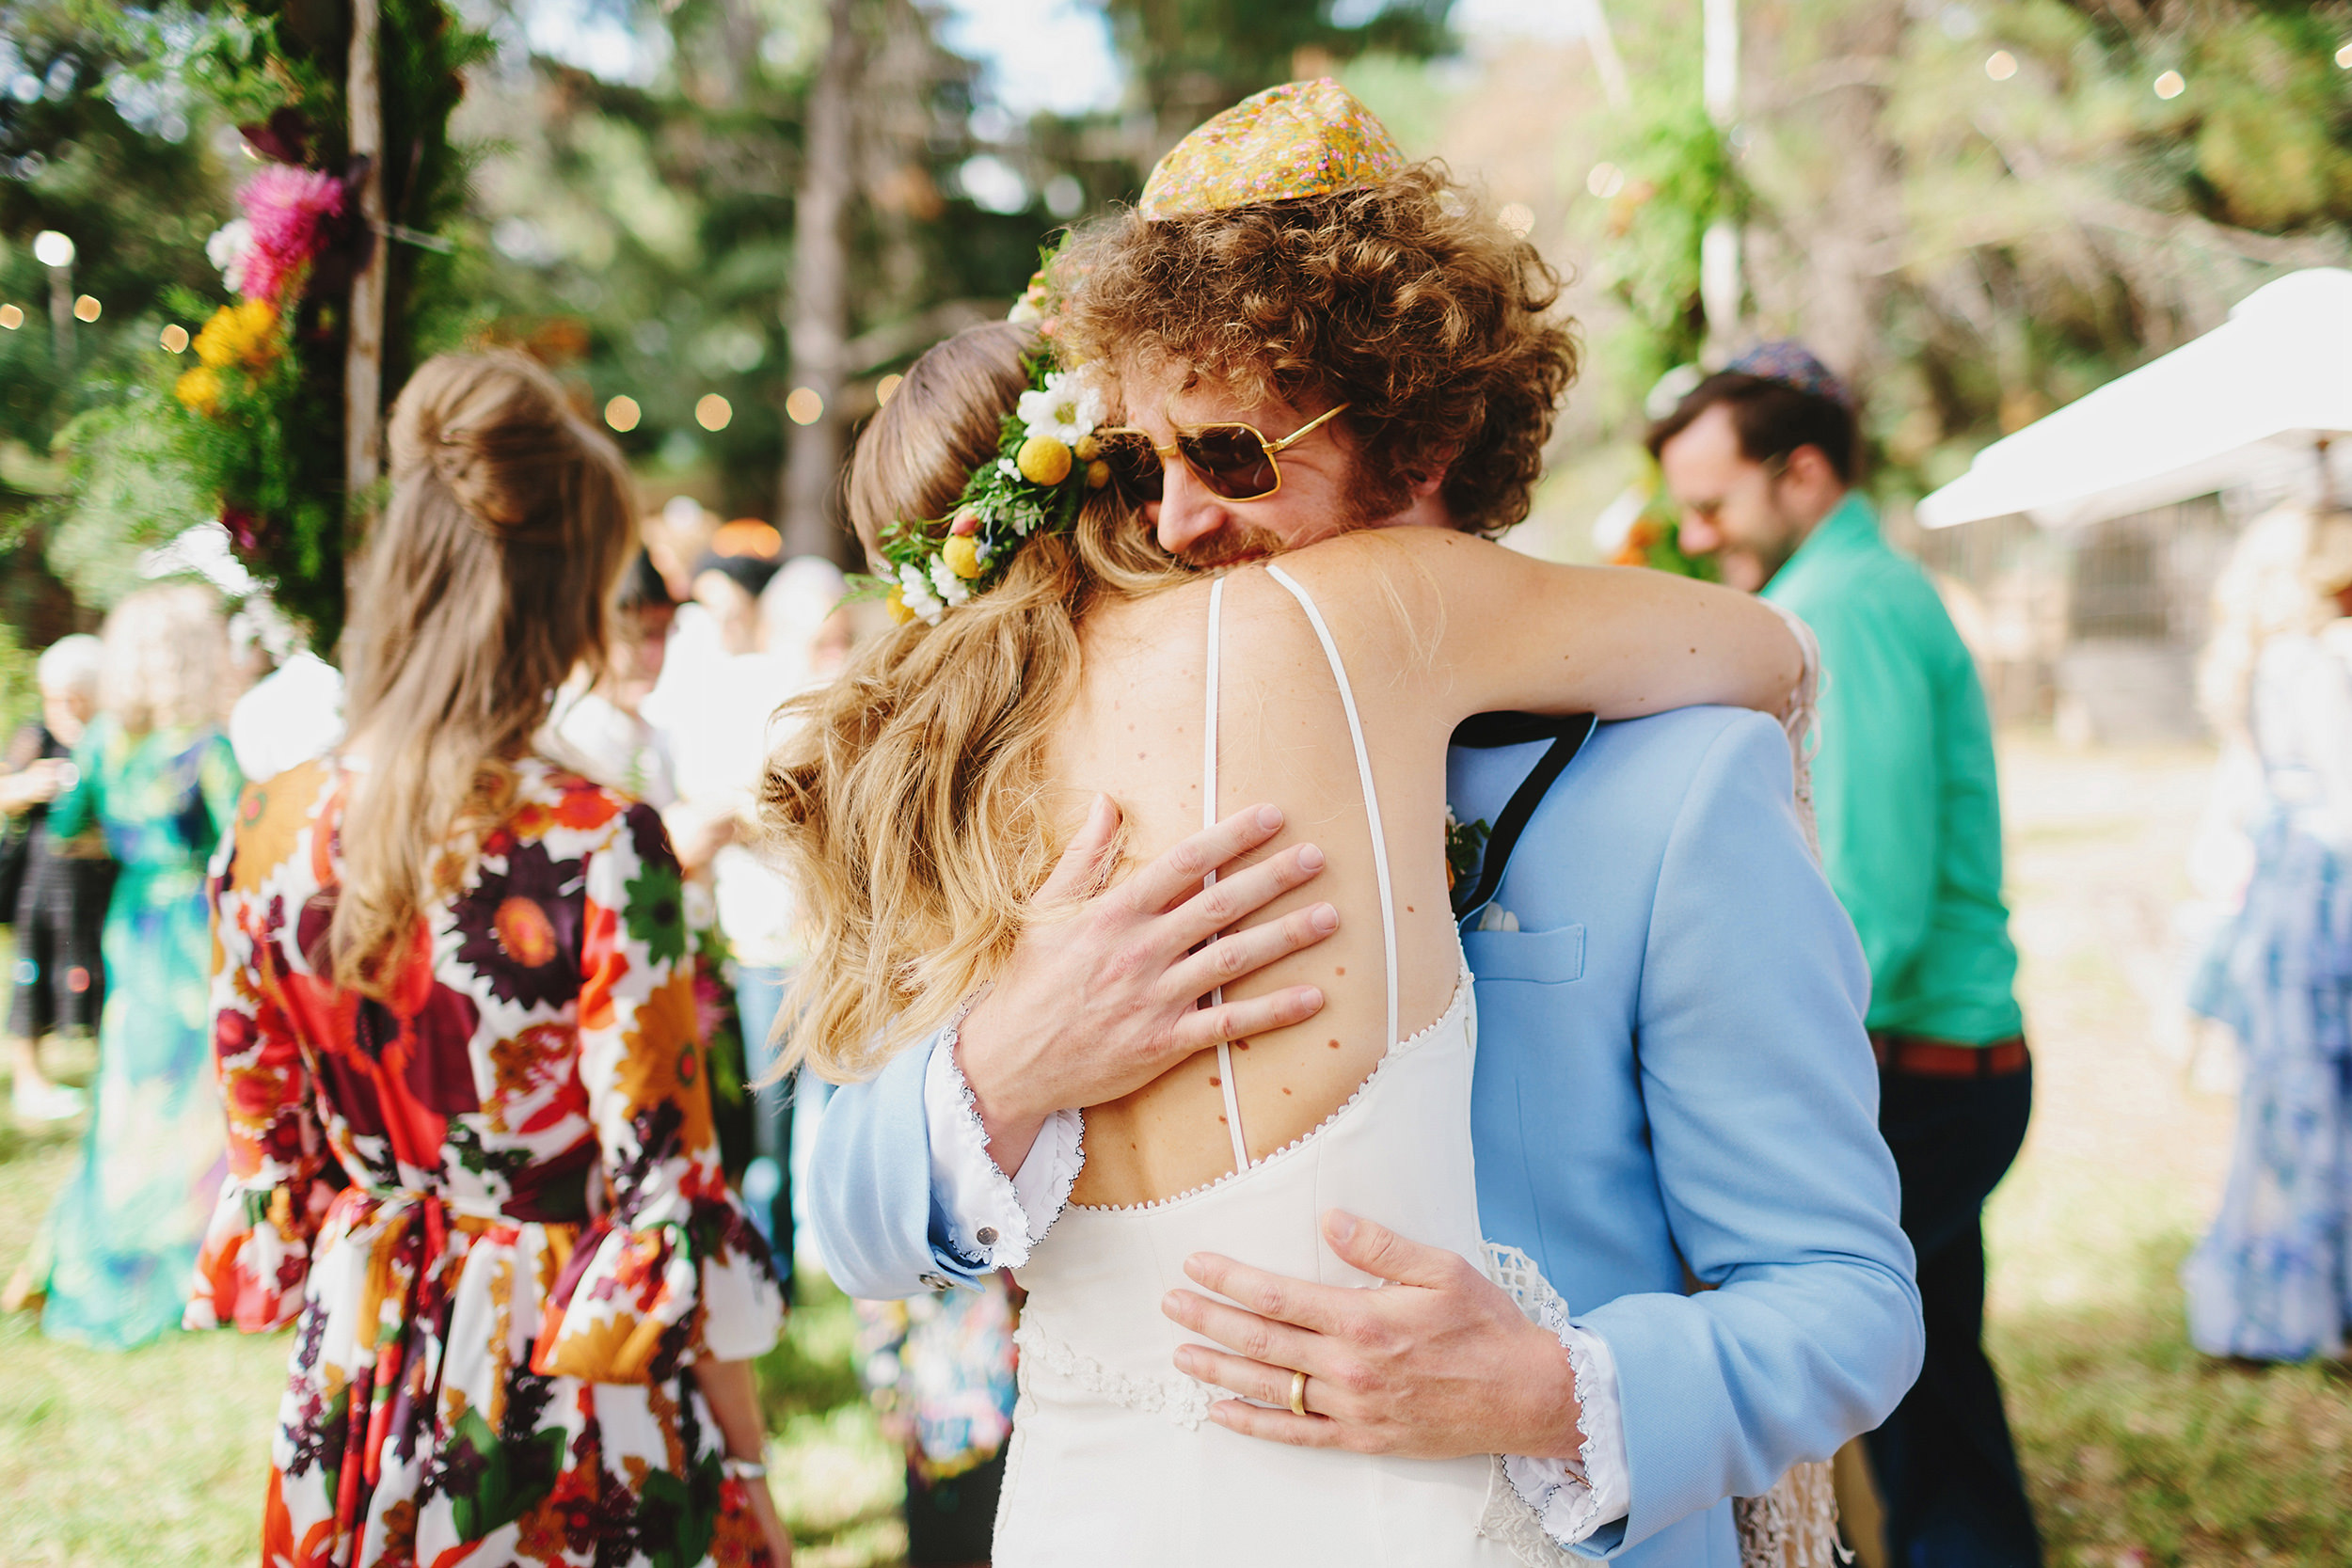 Melbourne_Vintage_Backyard_Wedding_Ben_Erin 042.JPG